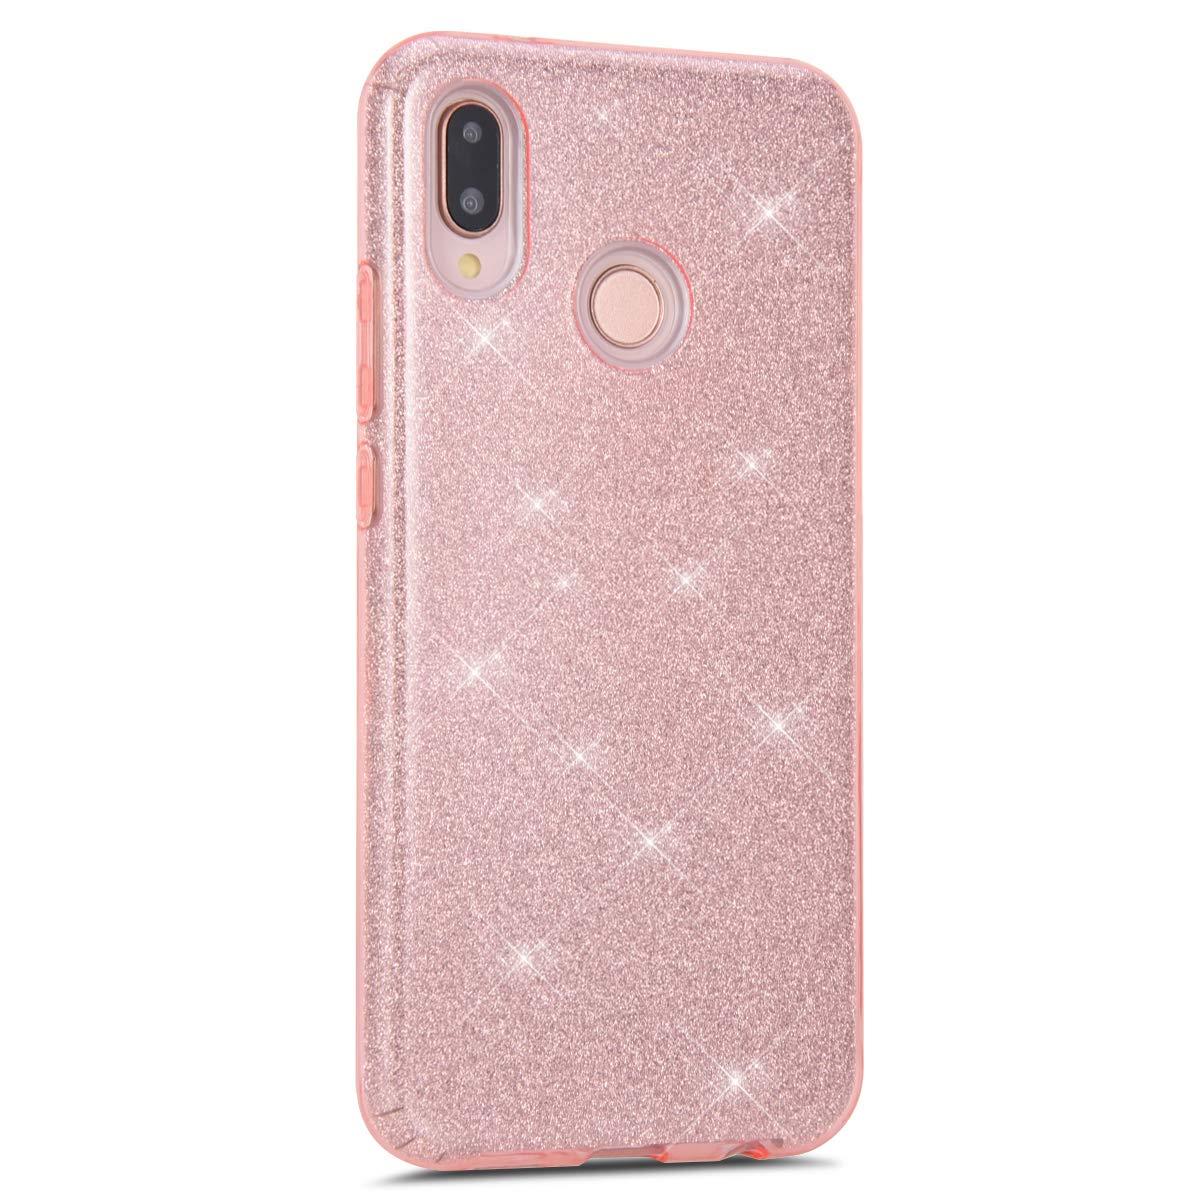 Felfy Kompatibel mit Huawei P20 Lite H/ülle Luxus Glitzer Gl/änzend Sparkle Handyh/ülle Ultra D/ünn Weich Gel TPU Silikon Transparent Crystal Case Kratzfeste Tasche Bumper Cover Case,Silber